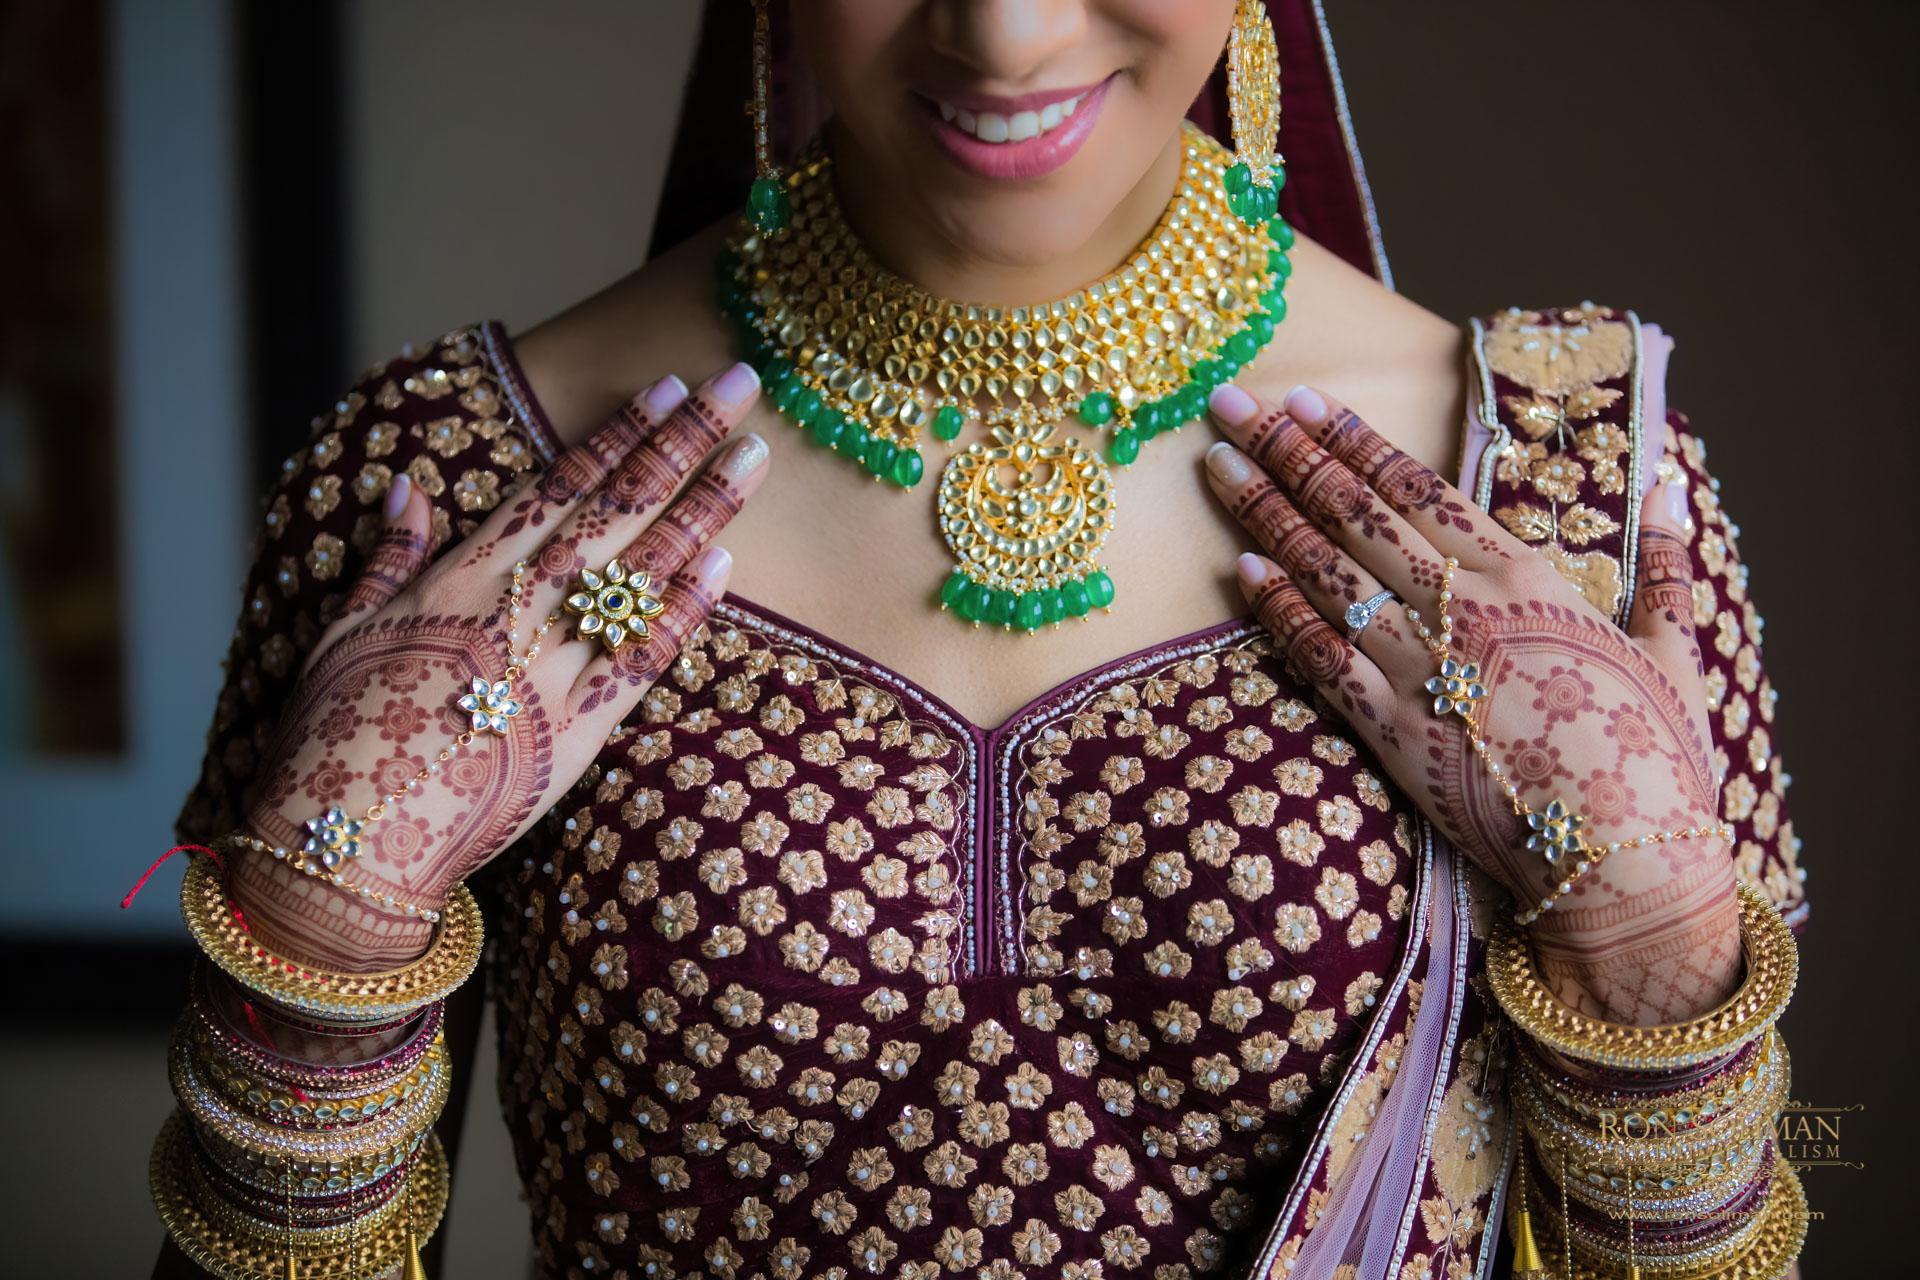 SHERATON PARSIPANNY WEDDING RM 6